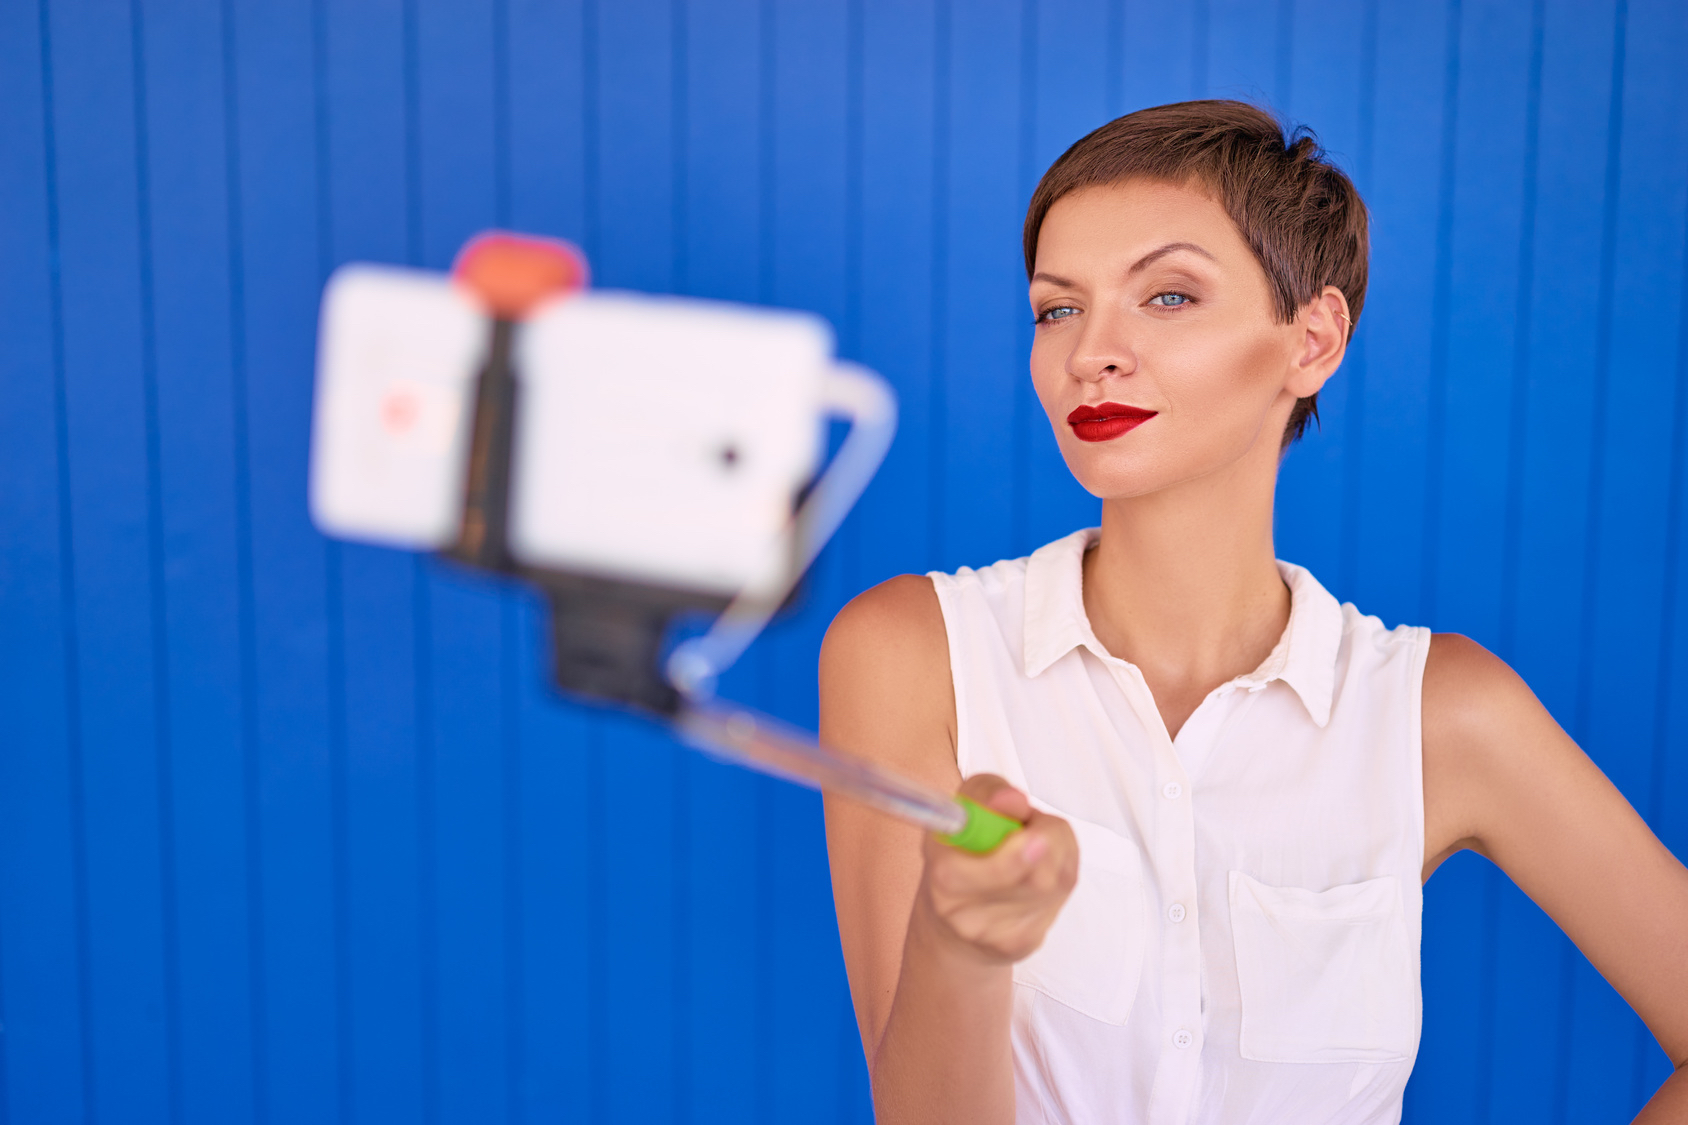 Coco selfie